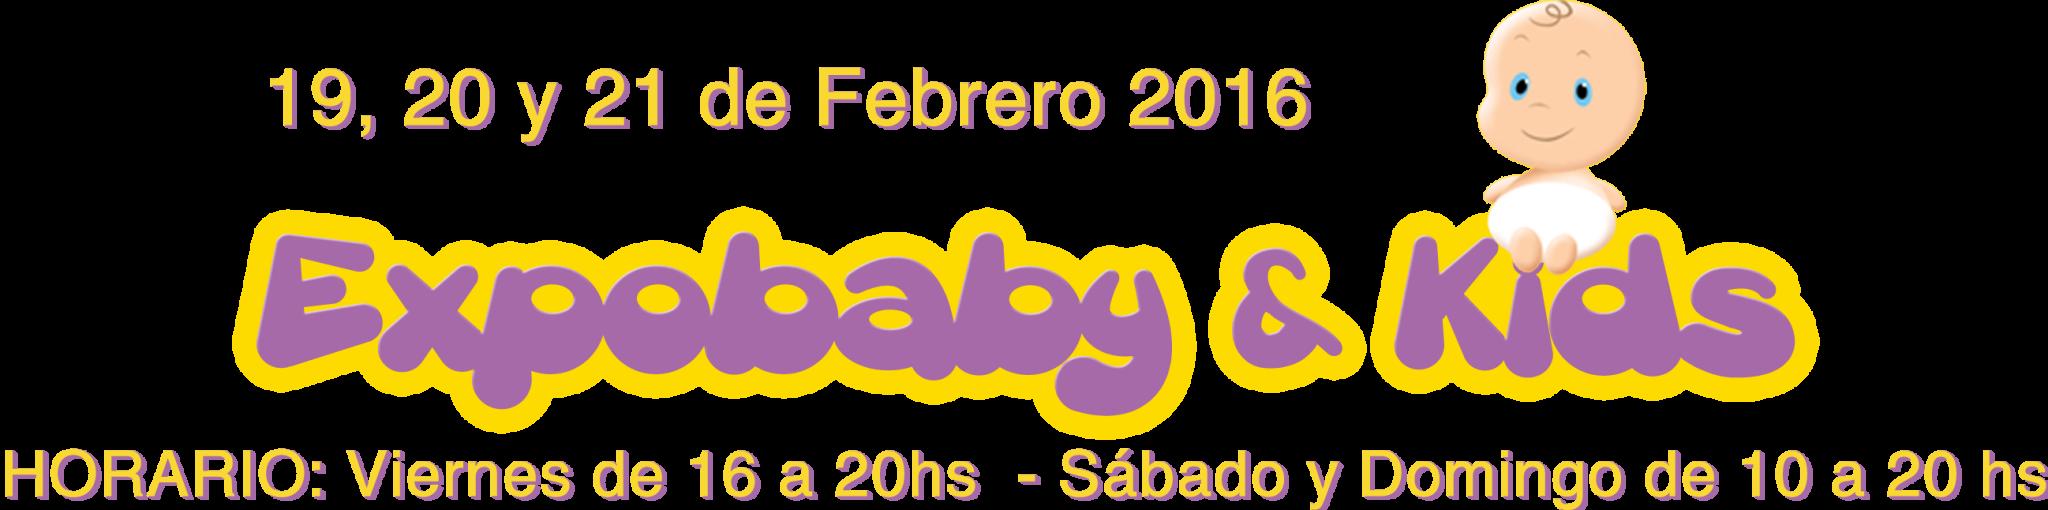 Expo Babys&Kids en BEC. Talleres infantiles, creativos y educativos. Bilbao